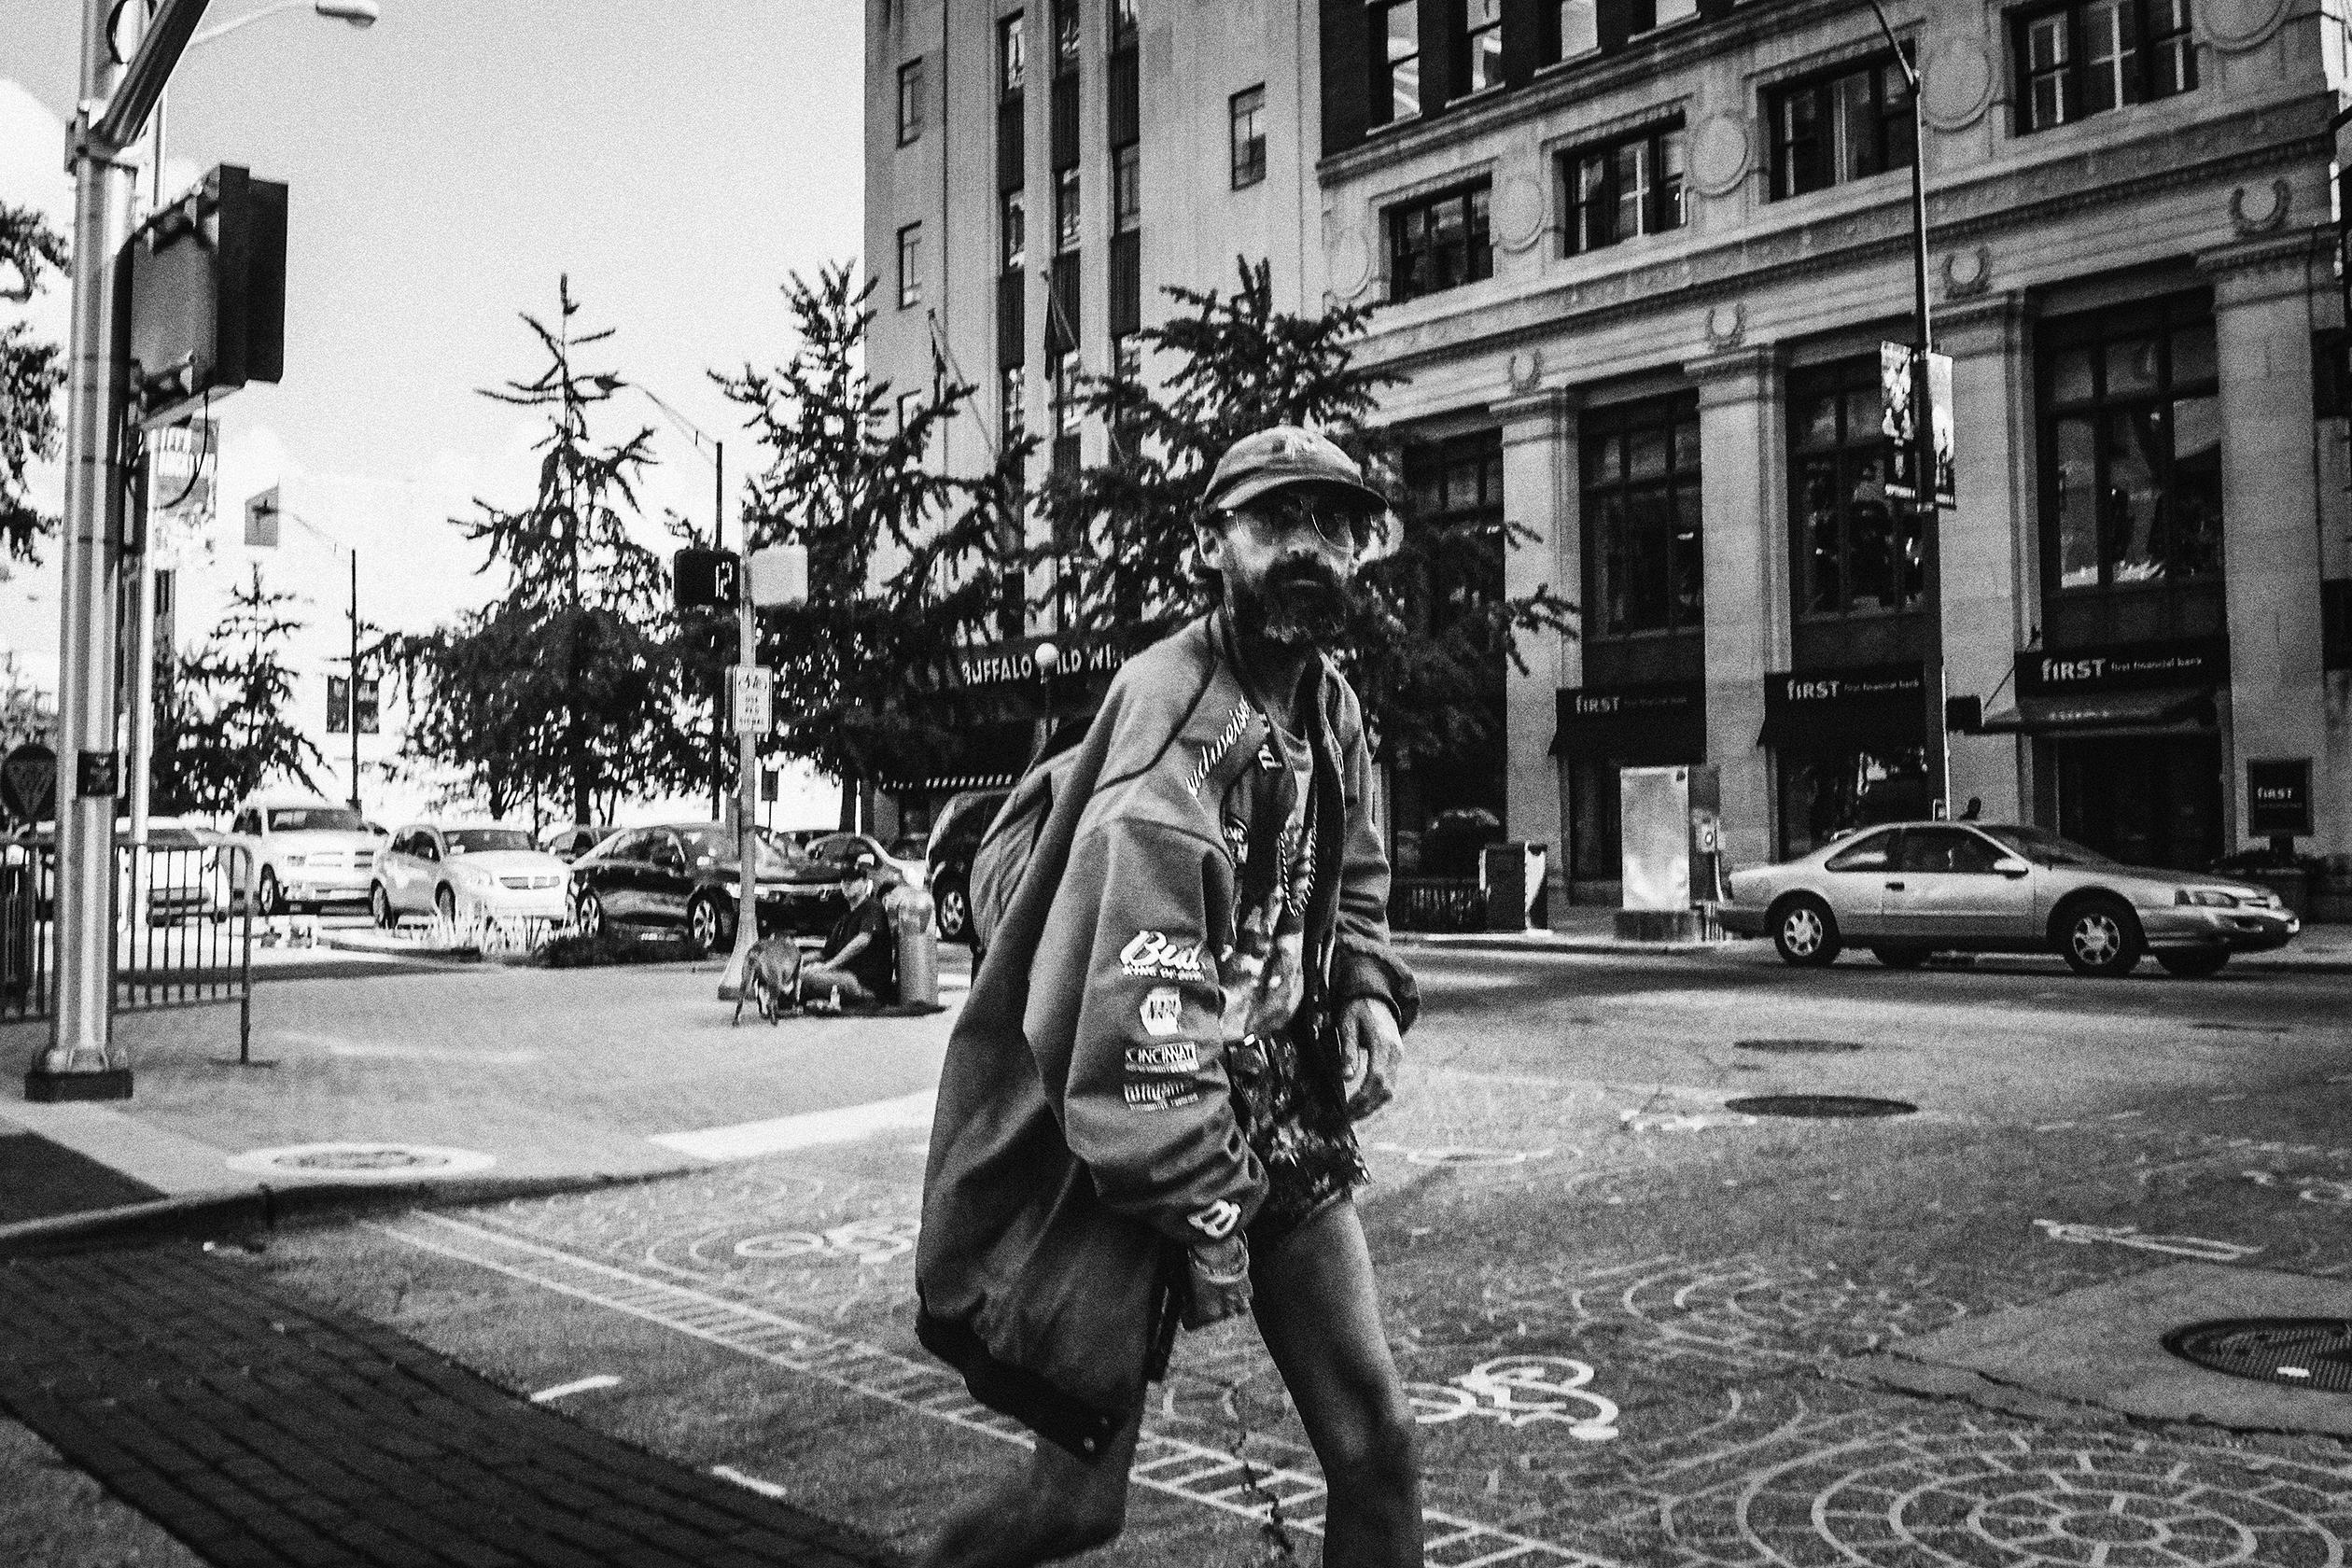 Street Photography Work-10